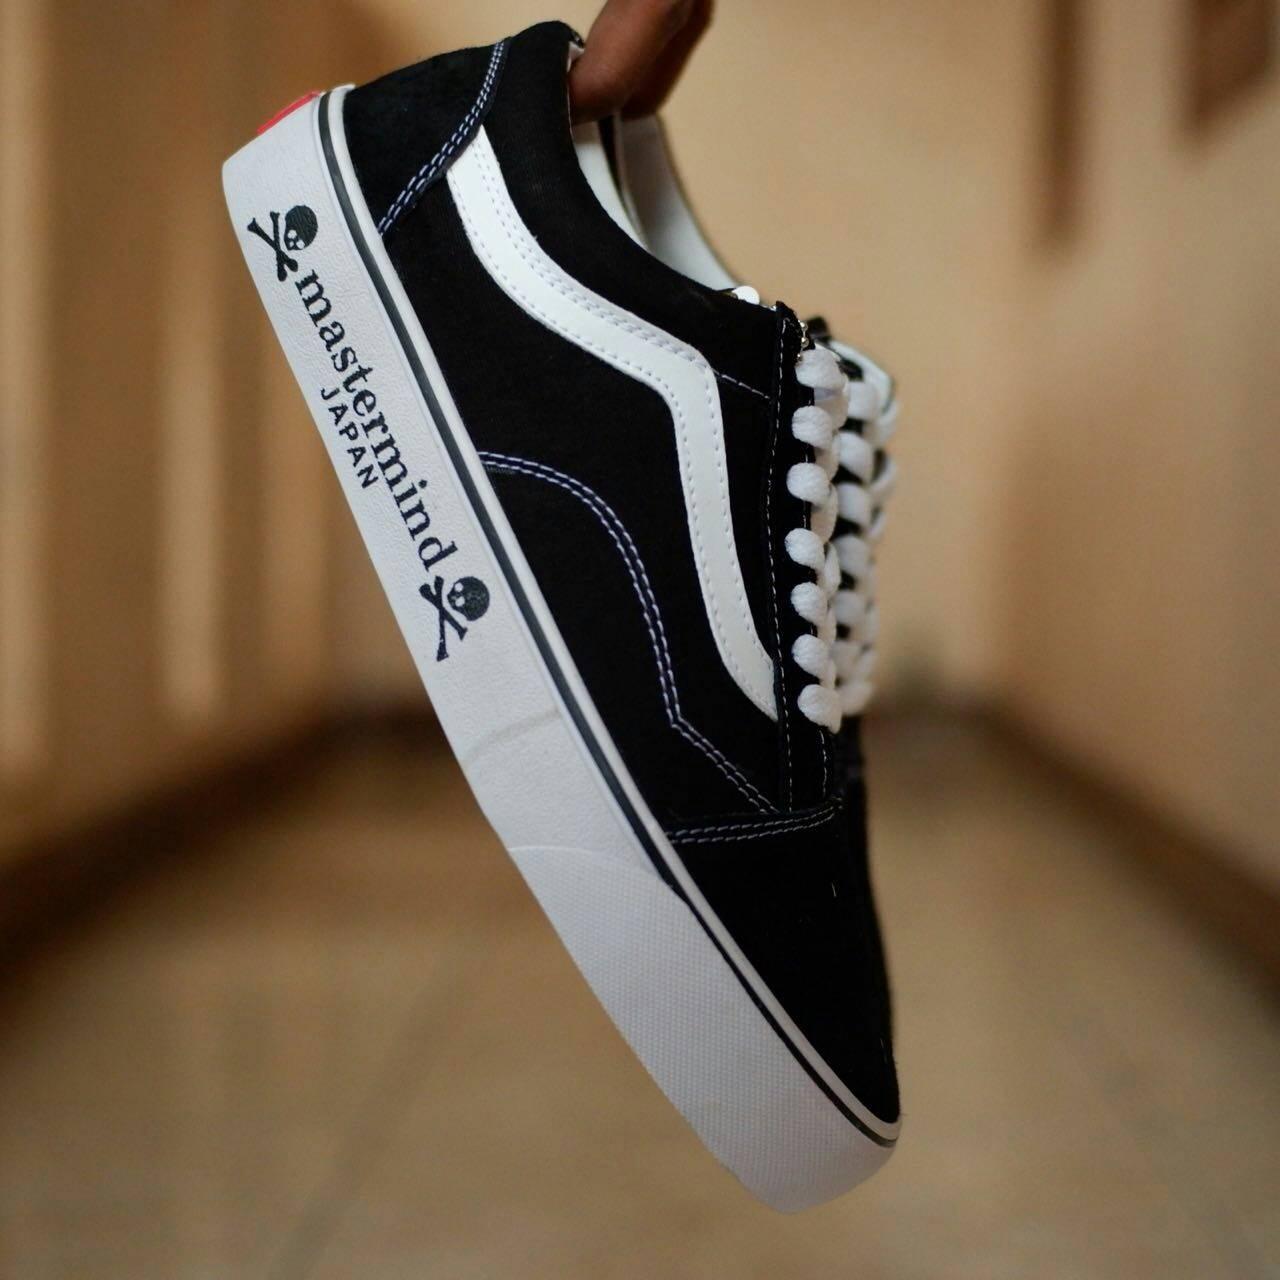 Gila Sepatu Sneakers Pria Handmade Prodigo Komodo Spatu Trendi Fashio